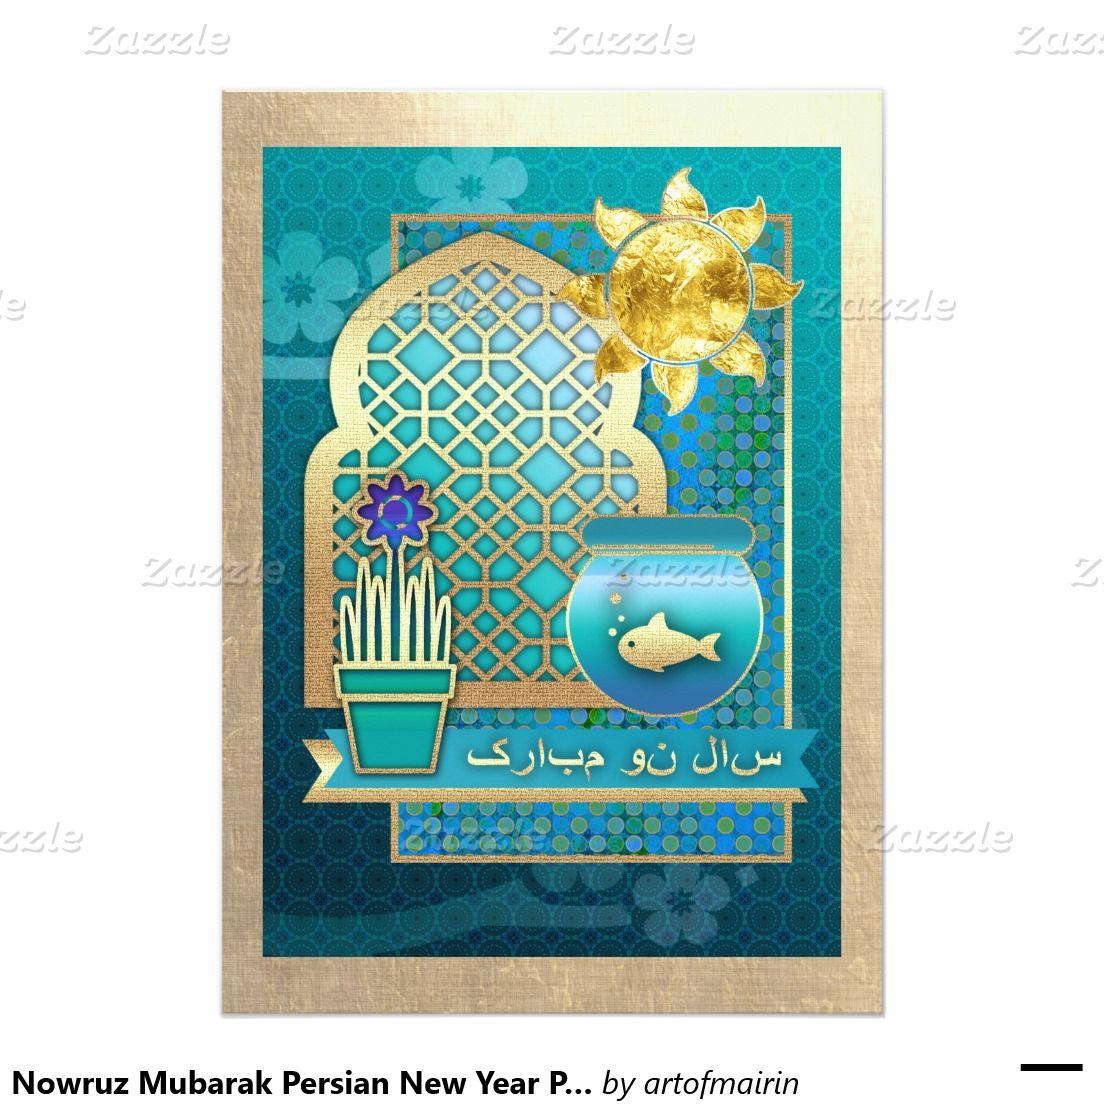 Wruz Mubarak Nowruz Celebration Muslim Spring